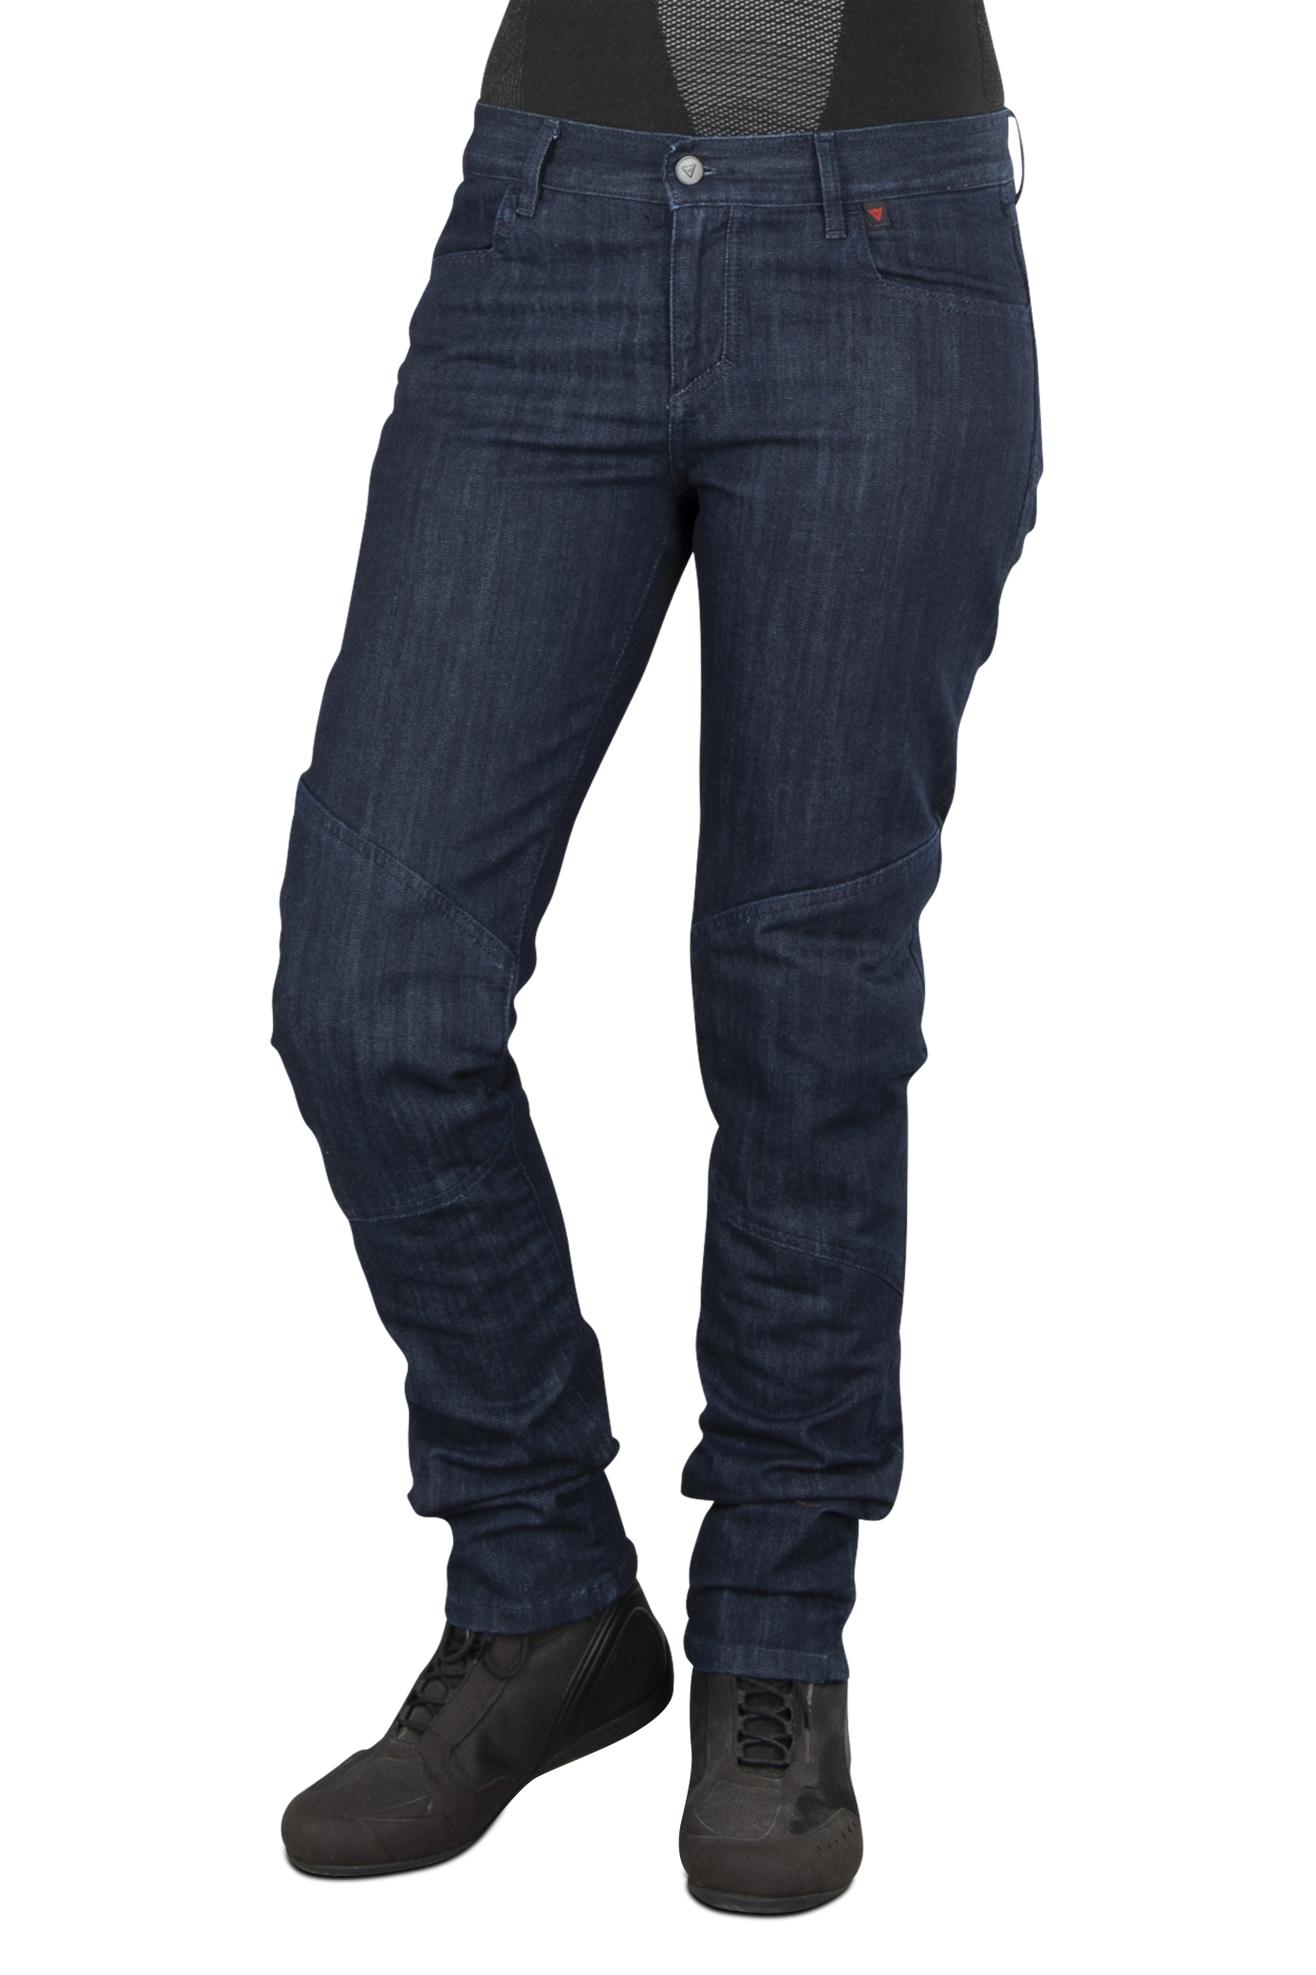 Dainese Jeans Donna  Amelia Slim Denim Scuro